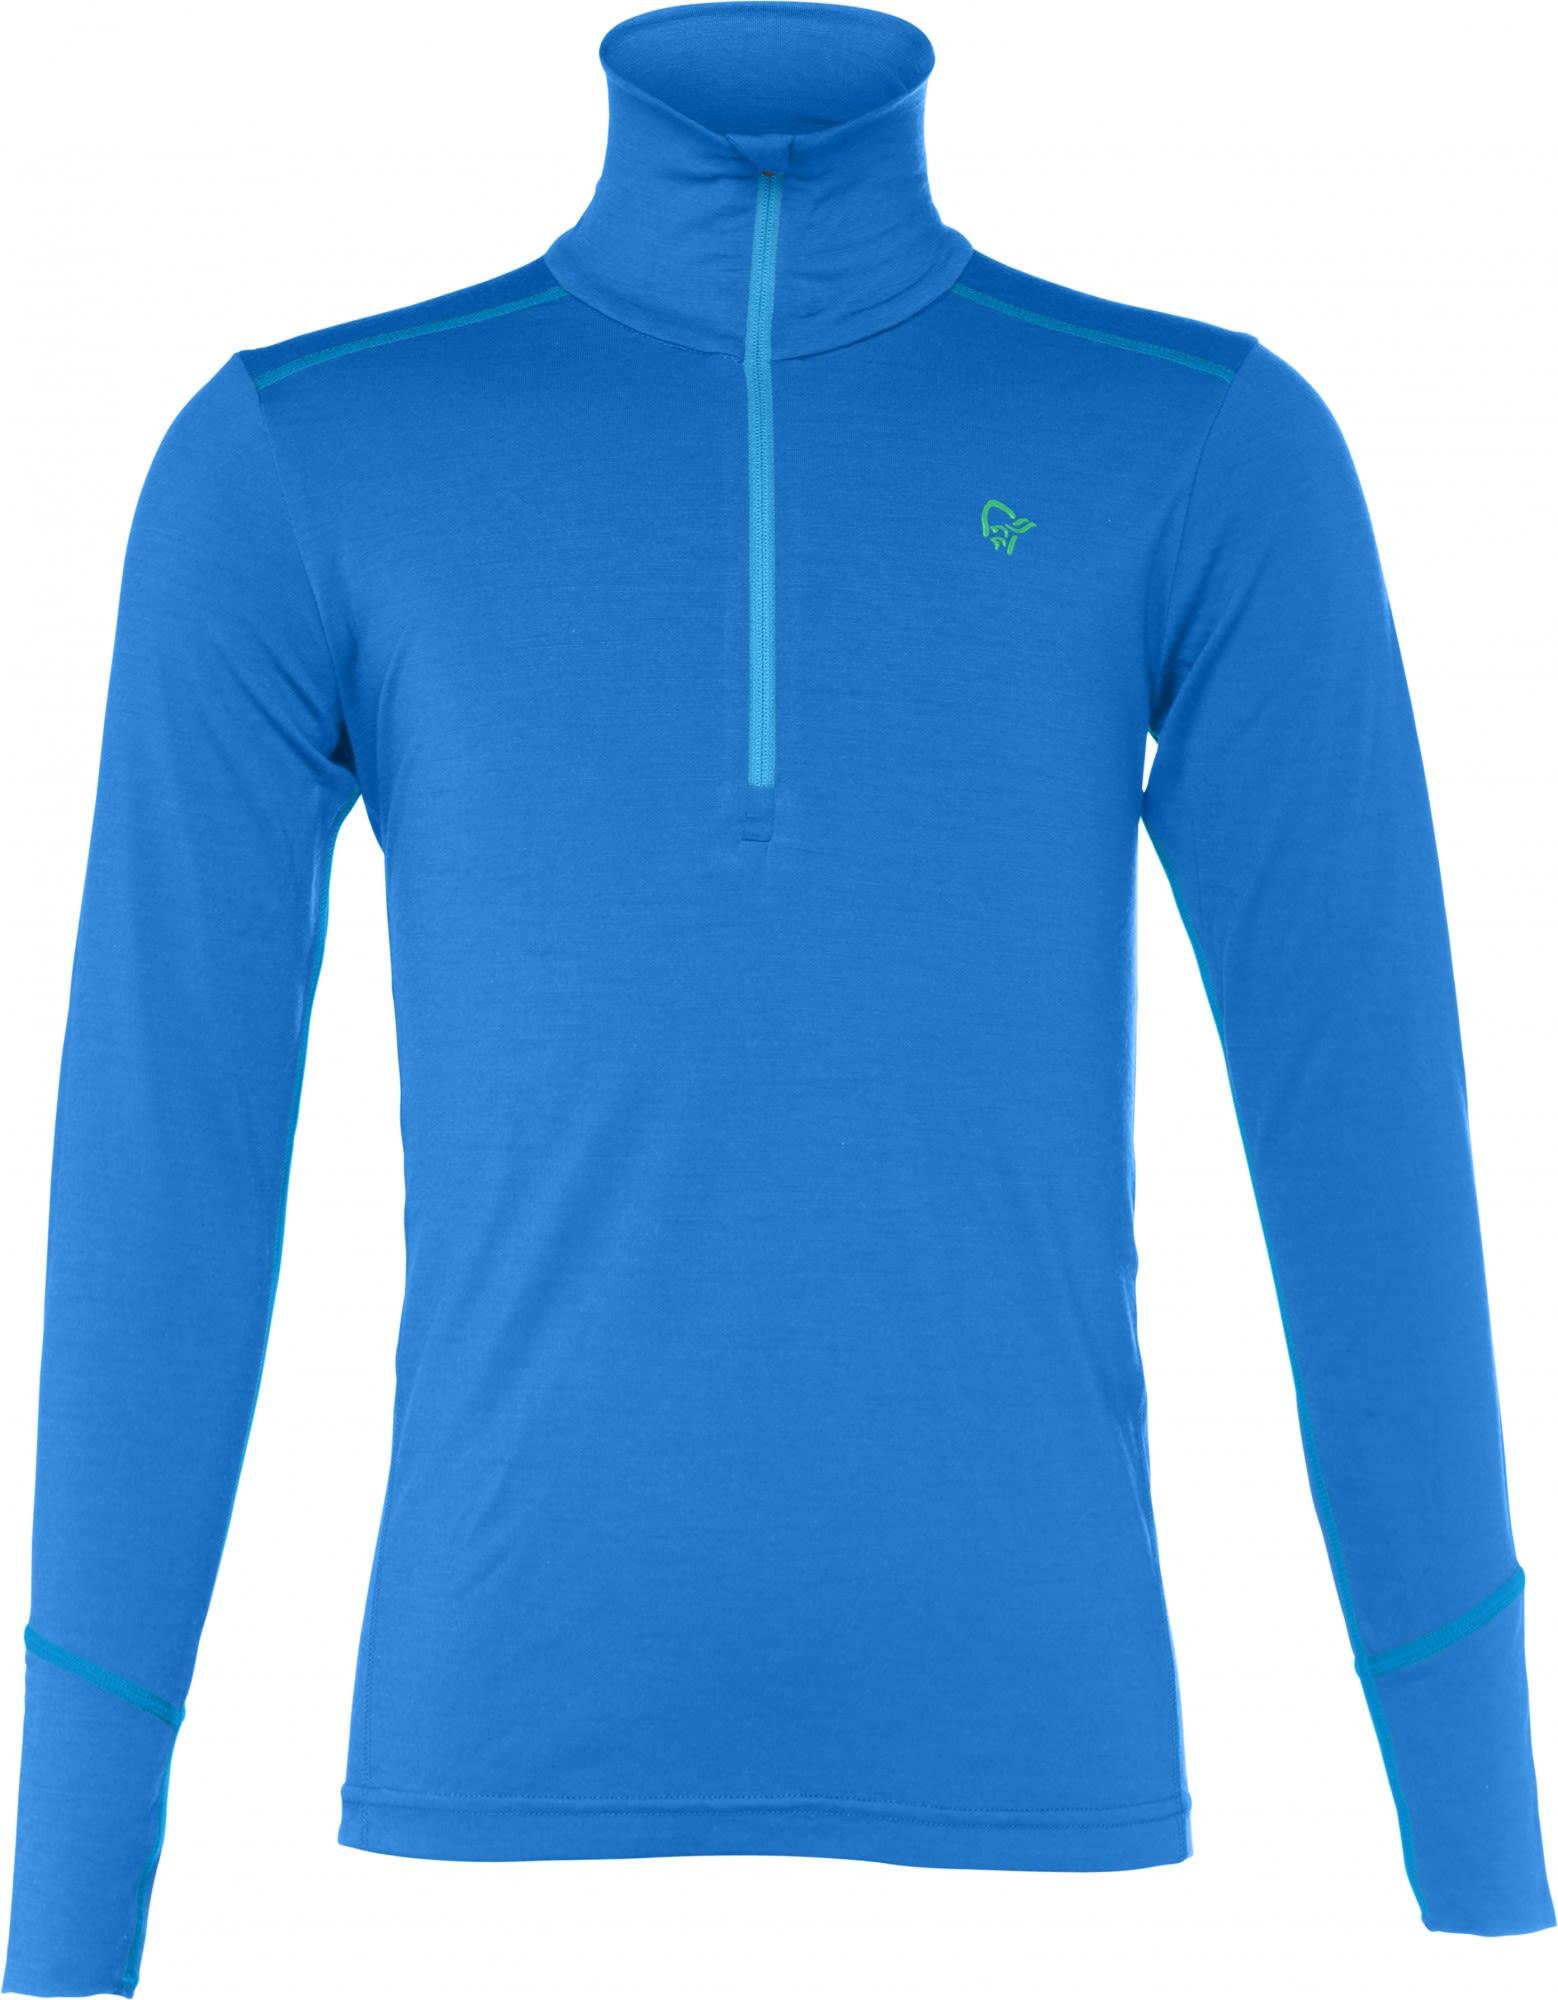 Norrona Junior Wool Zip Neck Blau, Merino 140 -Farbe Signal Blue, 140